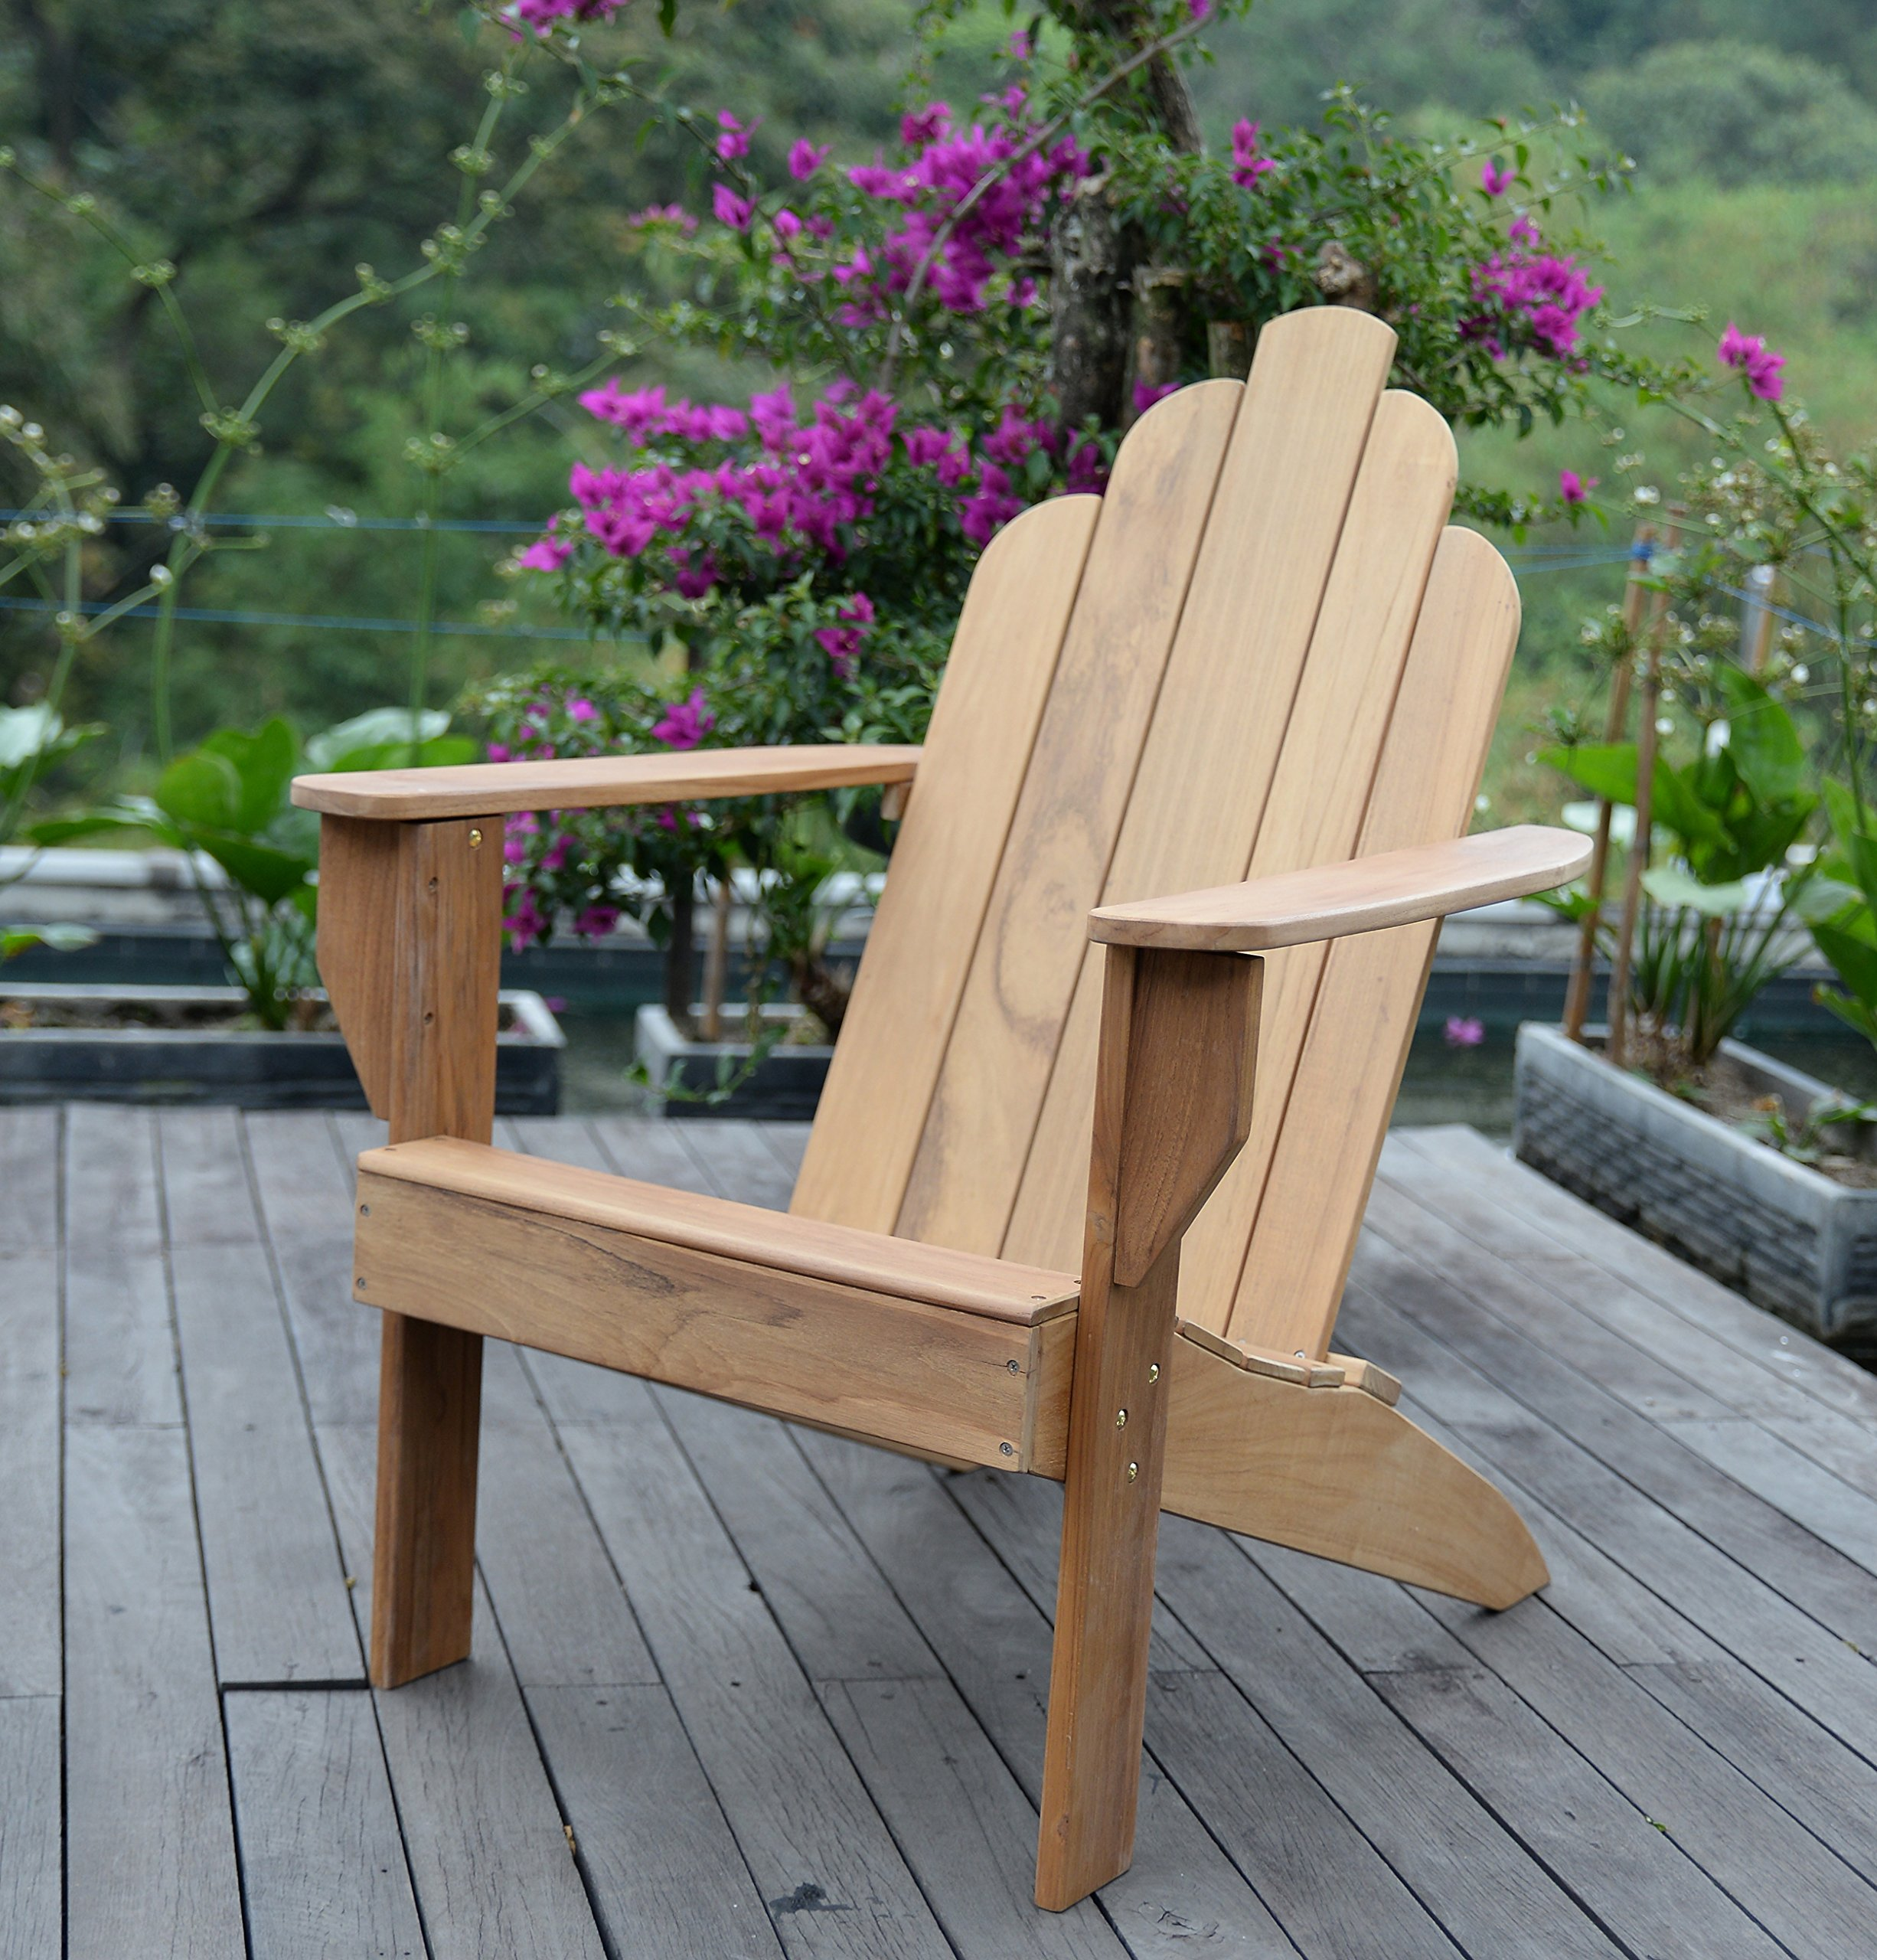 Cambridge-Casual AMZ-240275T Arie Teak Adirondack Adirondak Chair, Natural by Cambridge-Casual